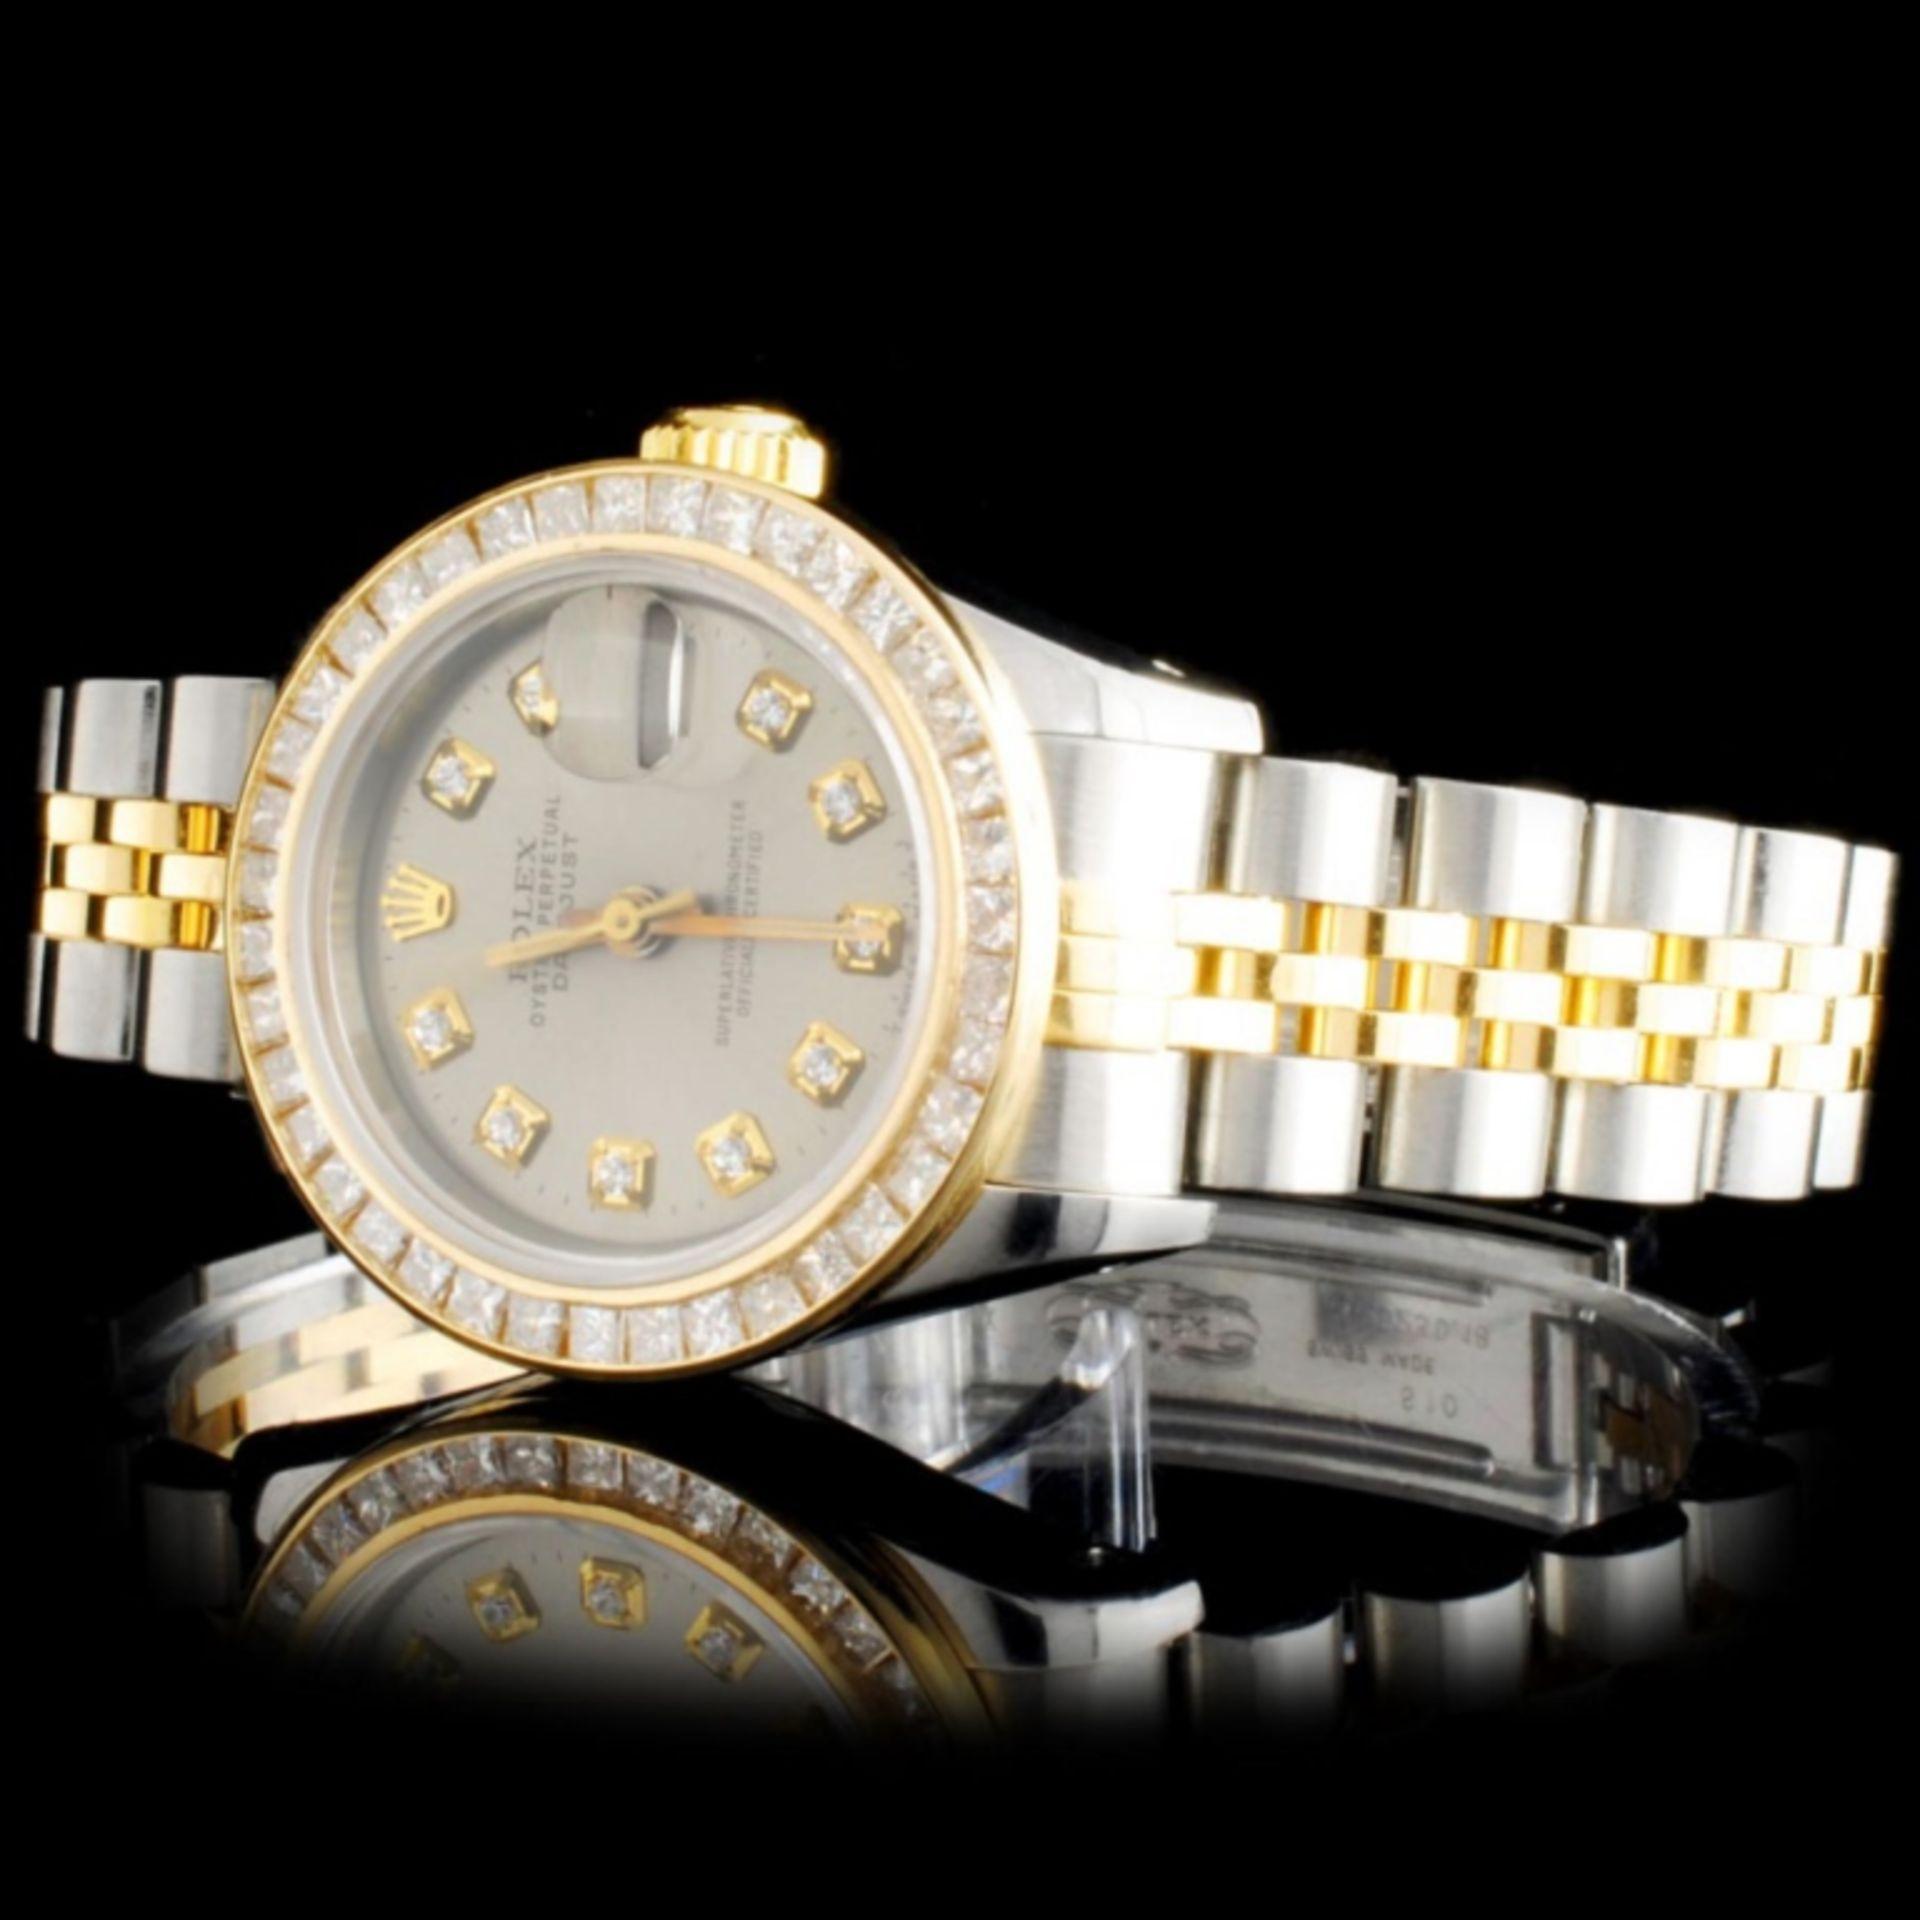 Rolex YG/SS DateJust Ladies Diamond Wristwatch - Image 2 of 5